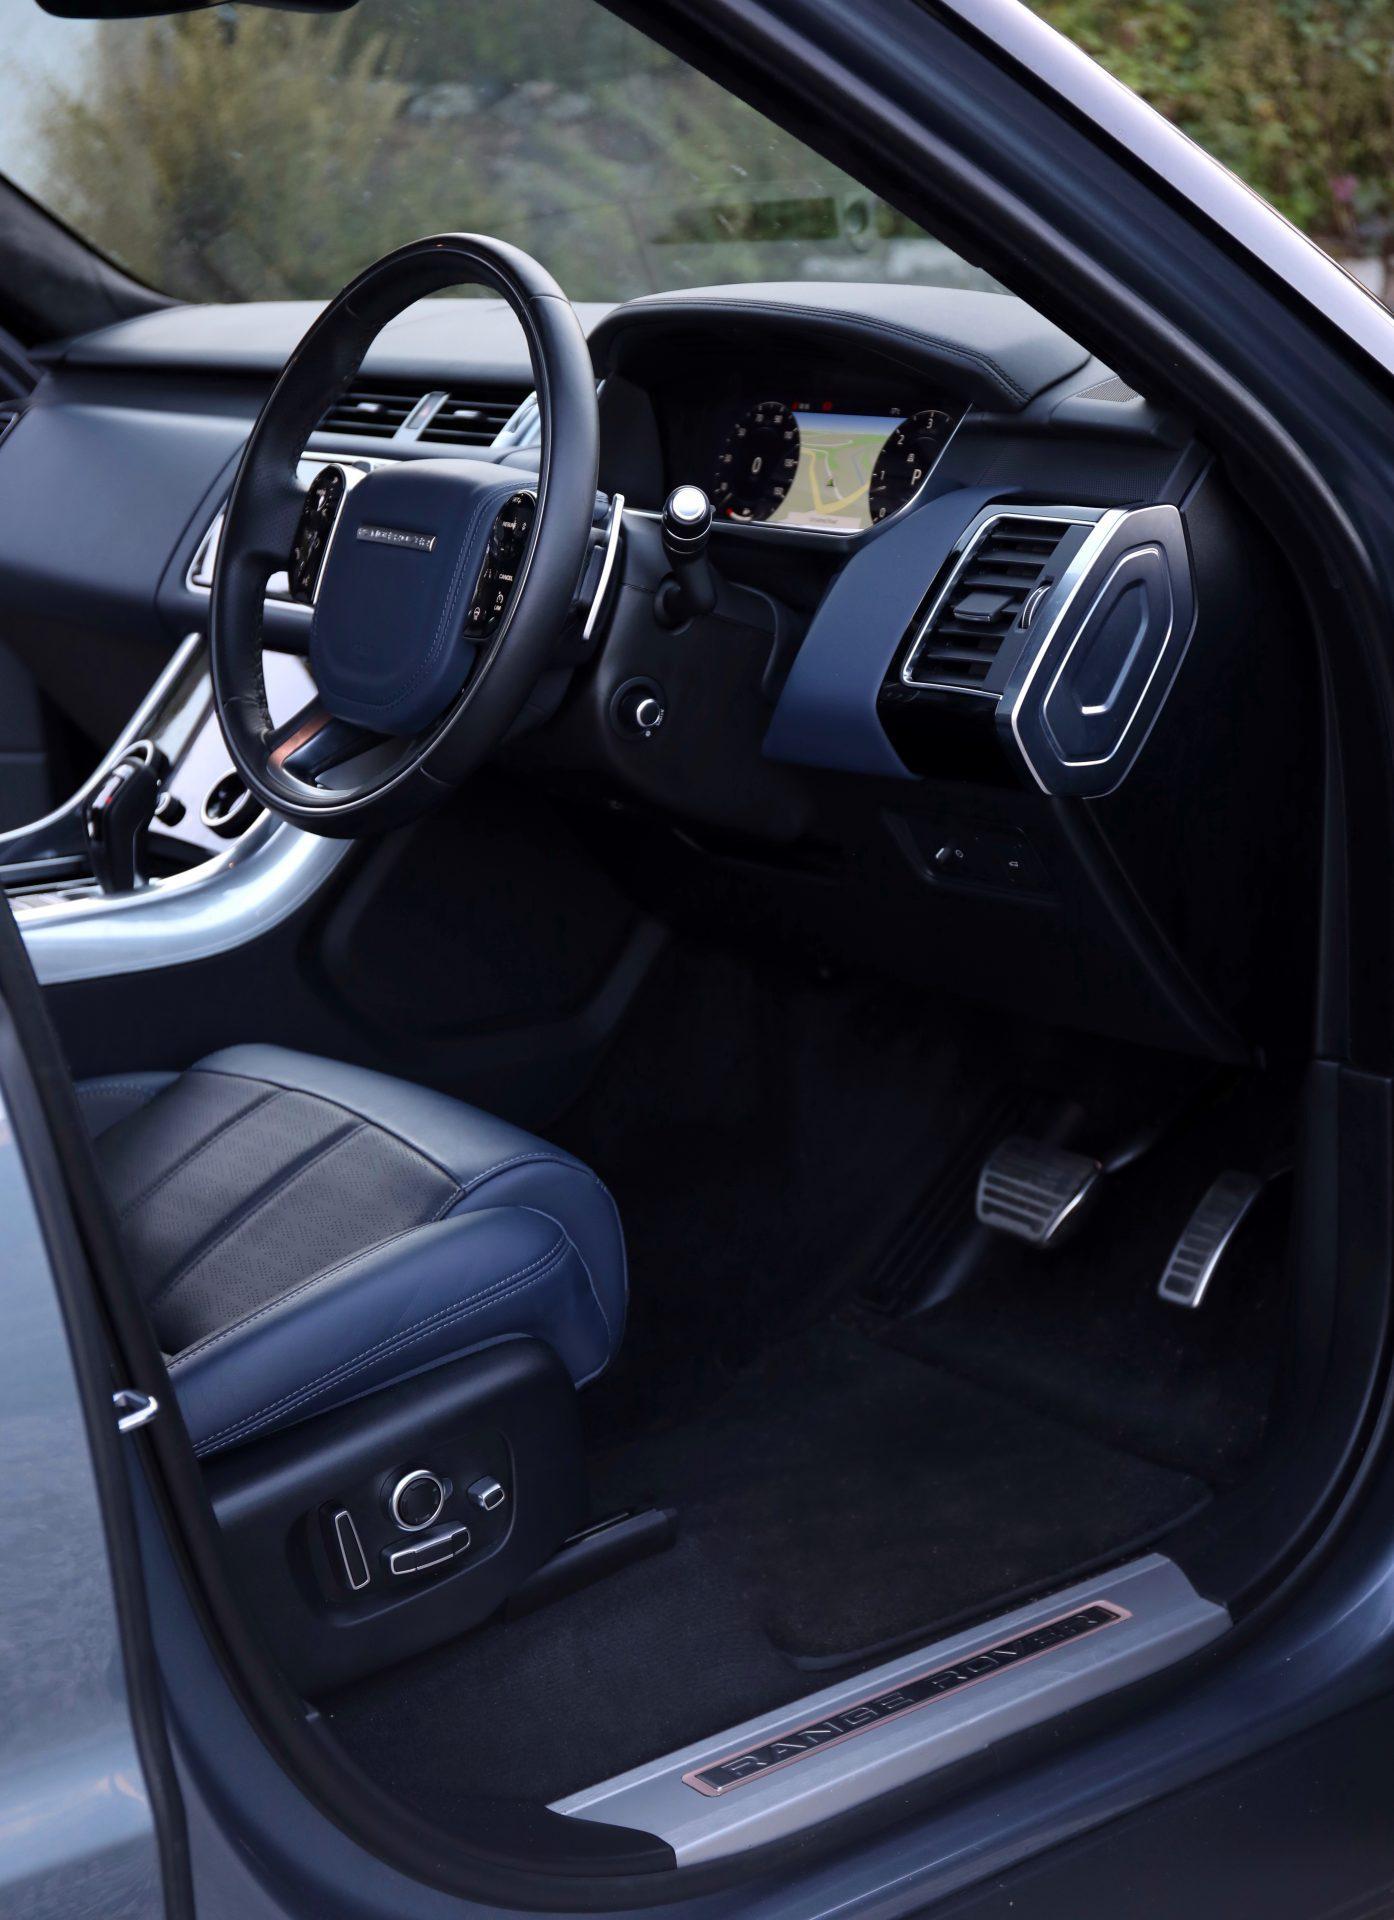 Range Rover SDV8 Autobiography Dynamic Driver's Seat